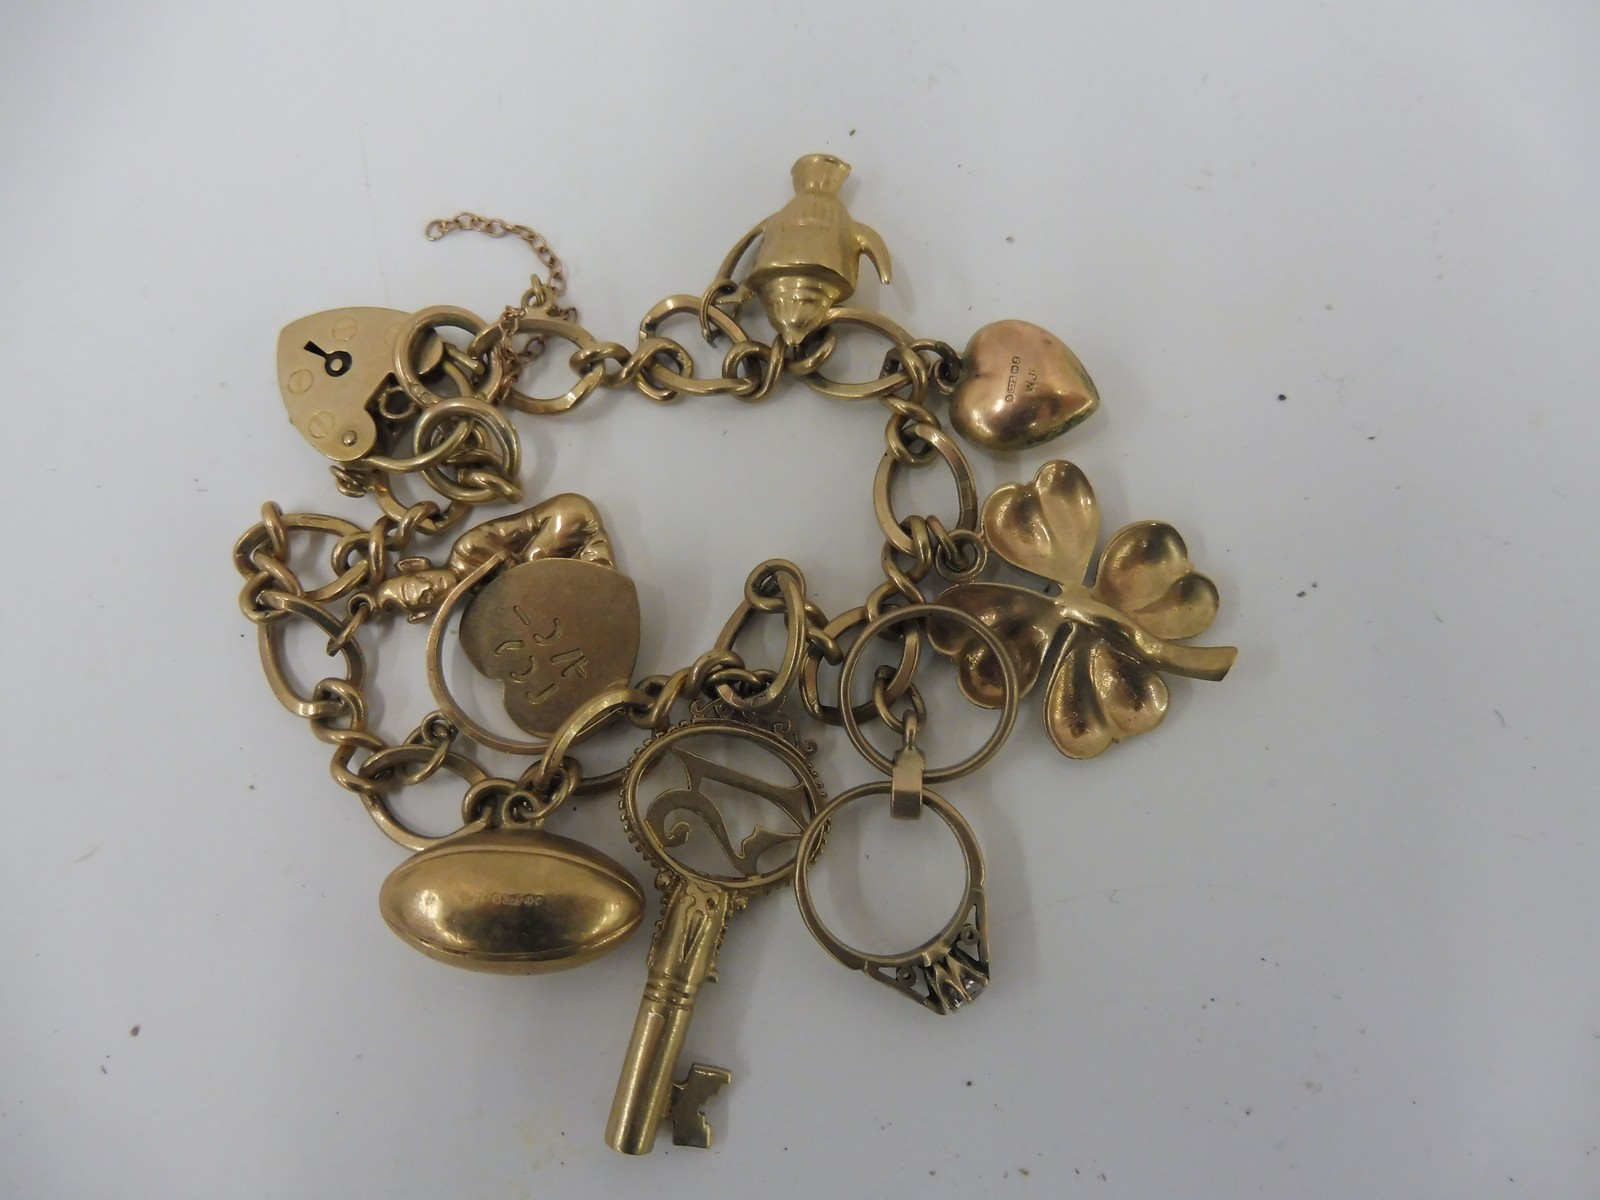 Lot 1 - A 9ct gold charm bracelet.